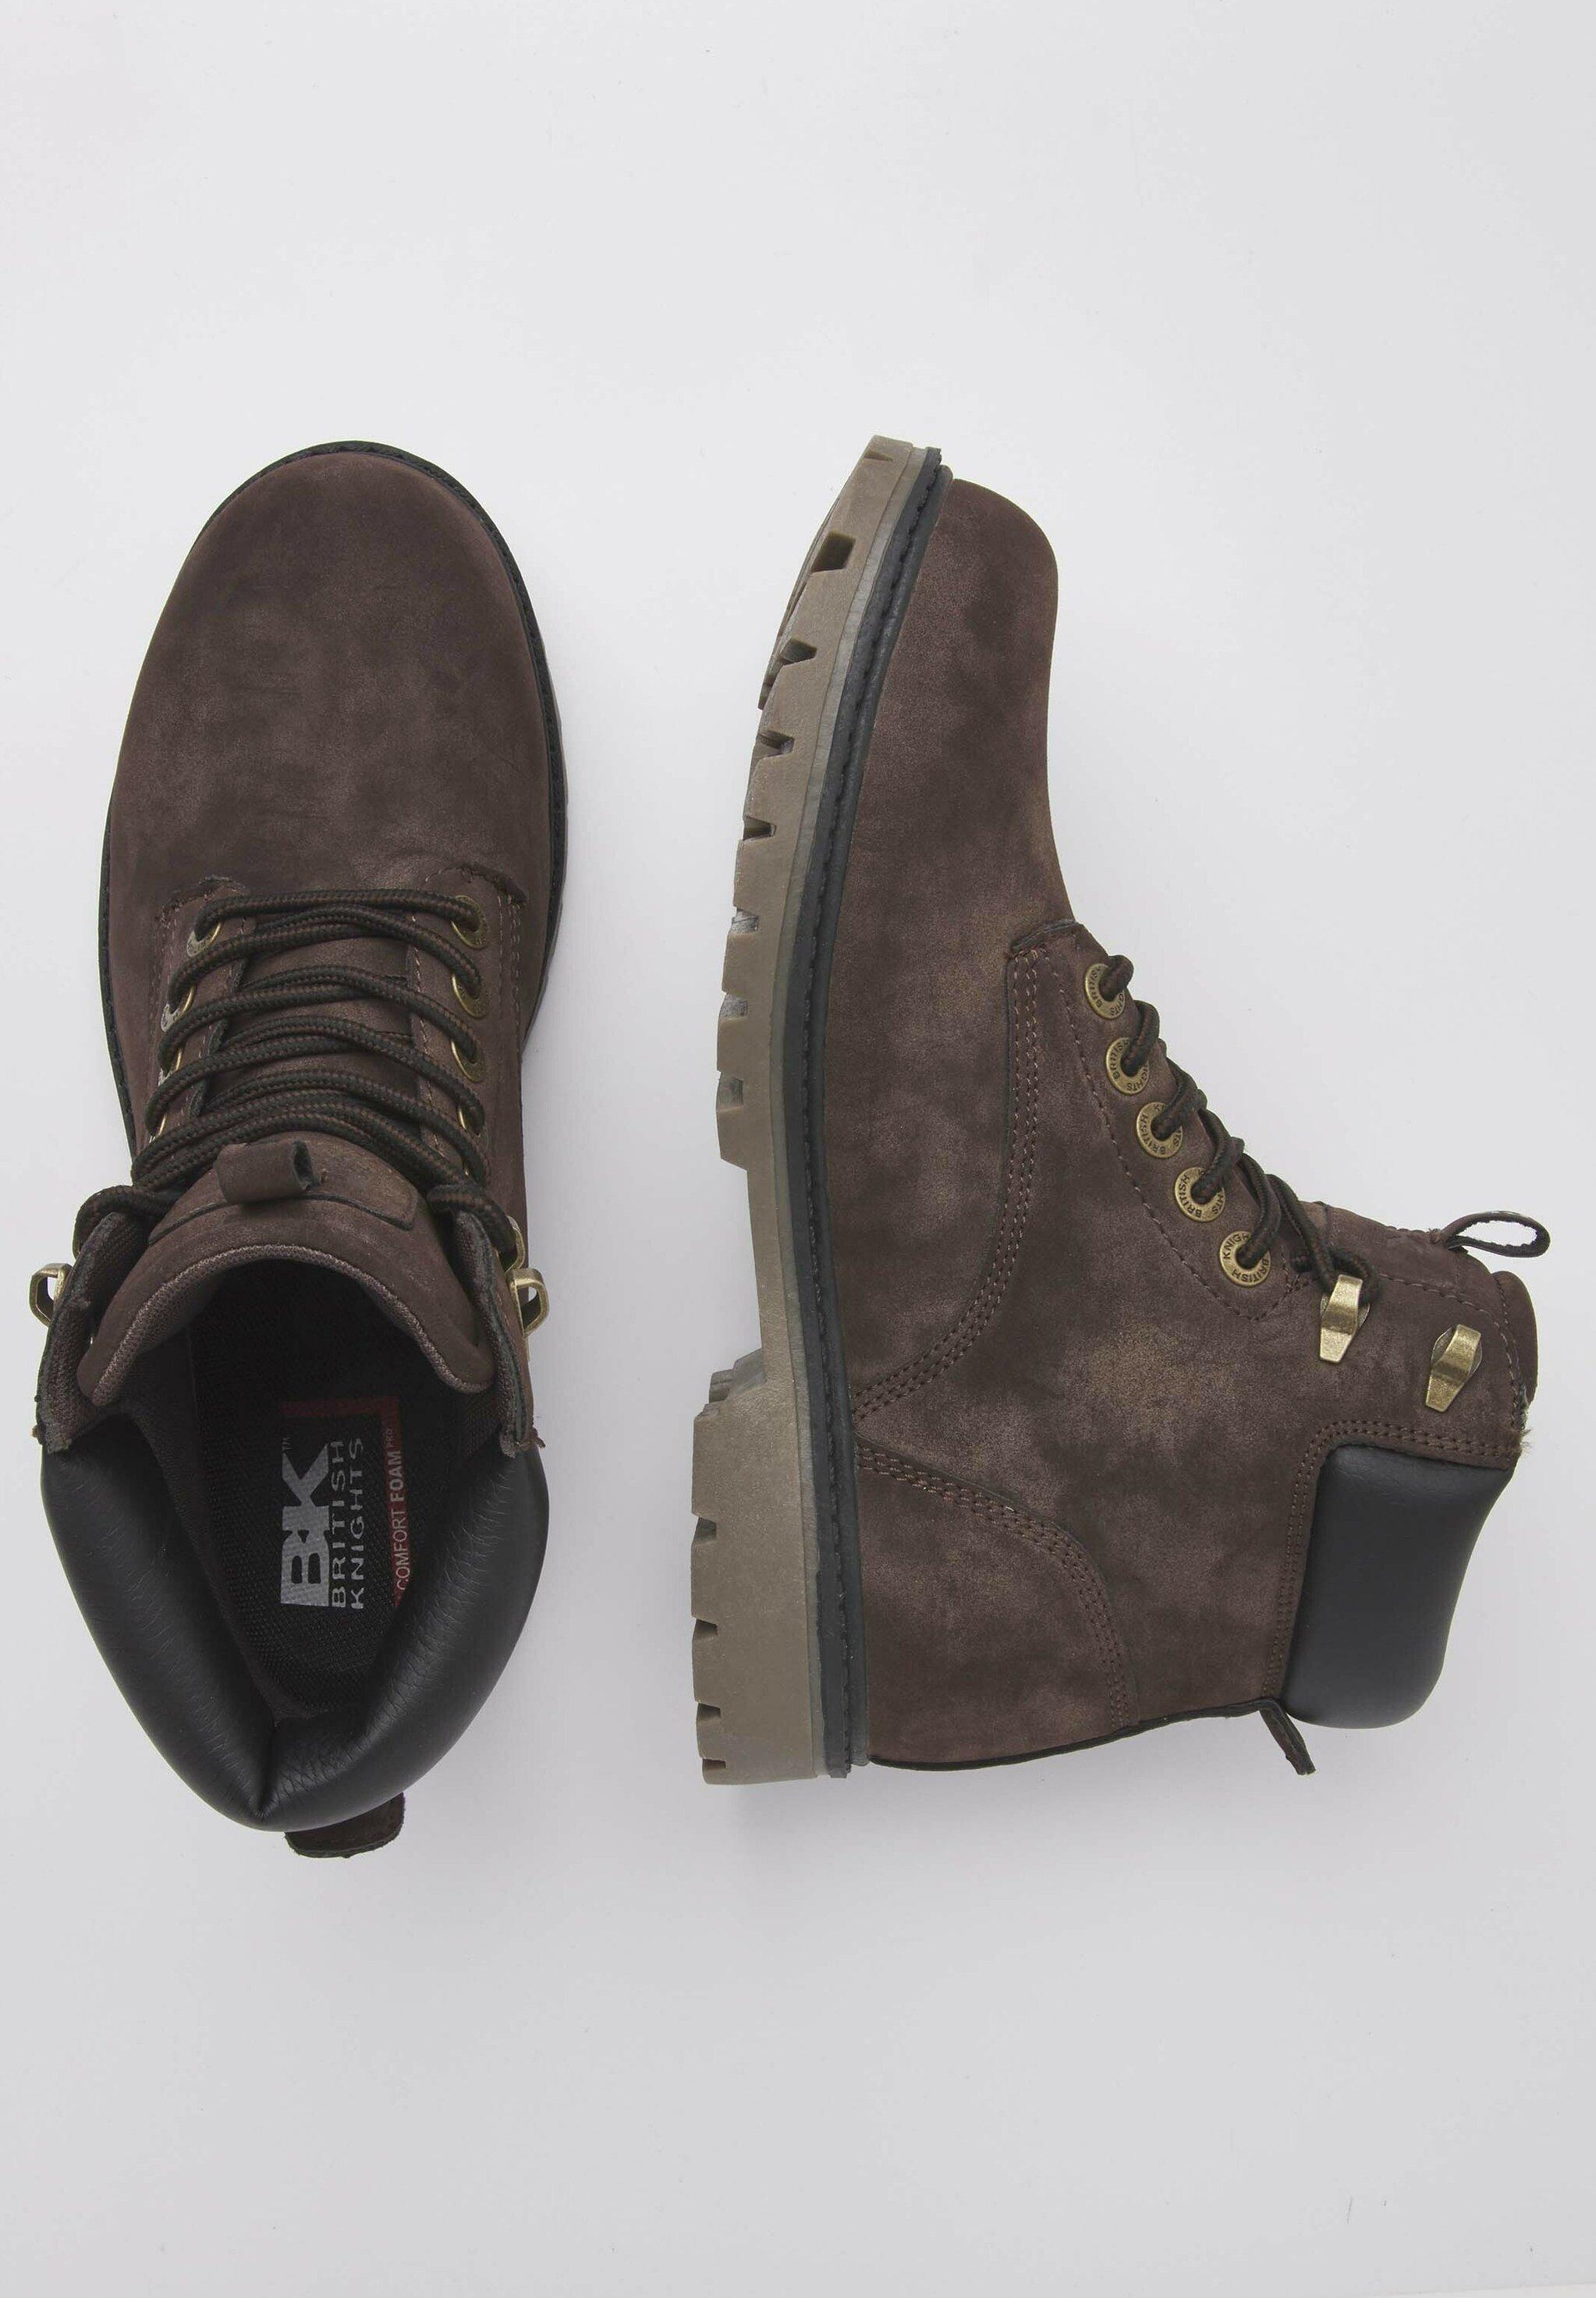 British Knights Sneaker Secco - Ankelstøvler Dk Brown/black